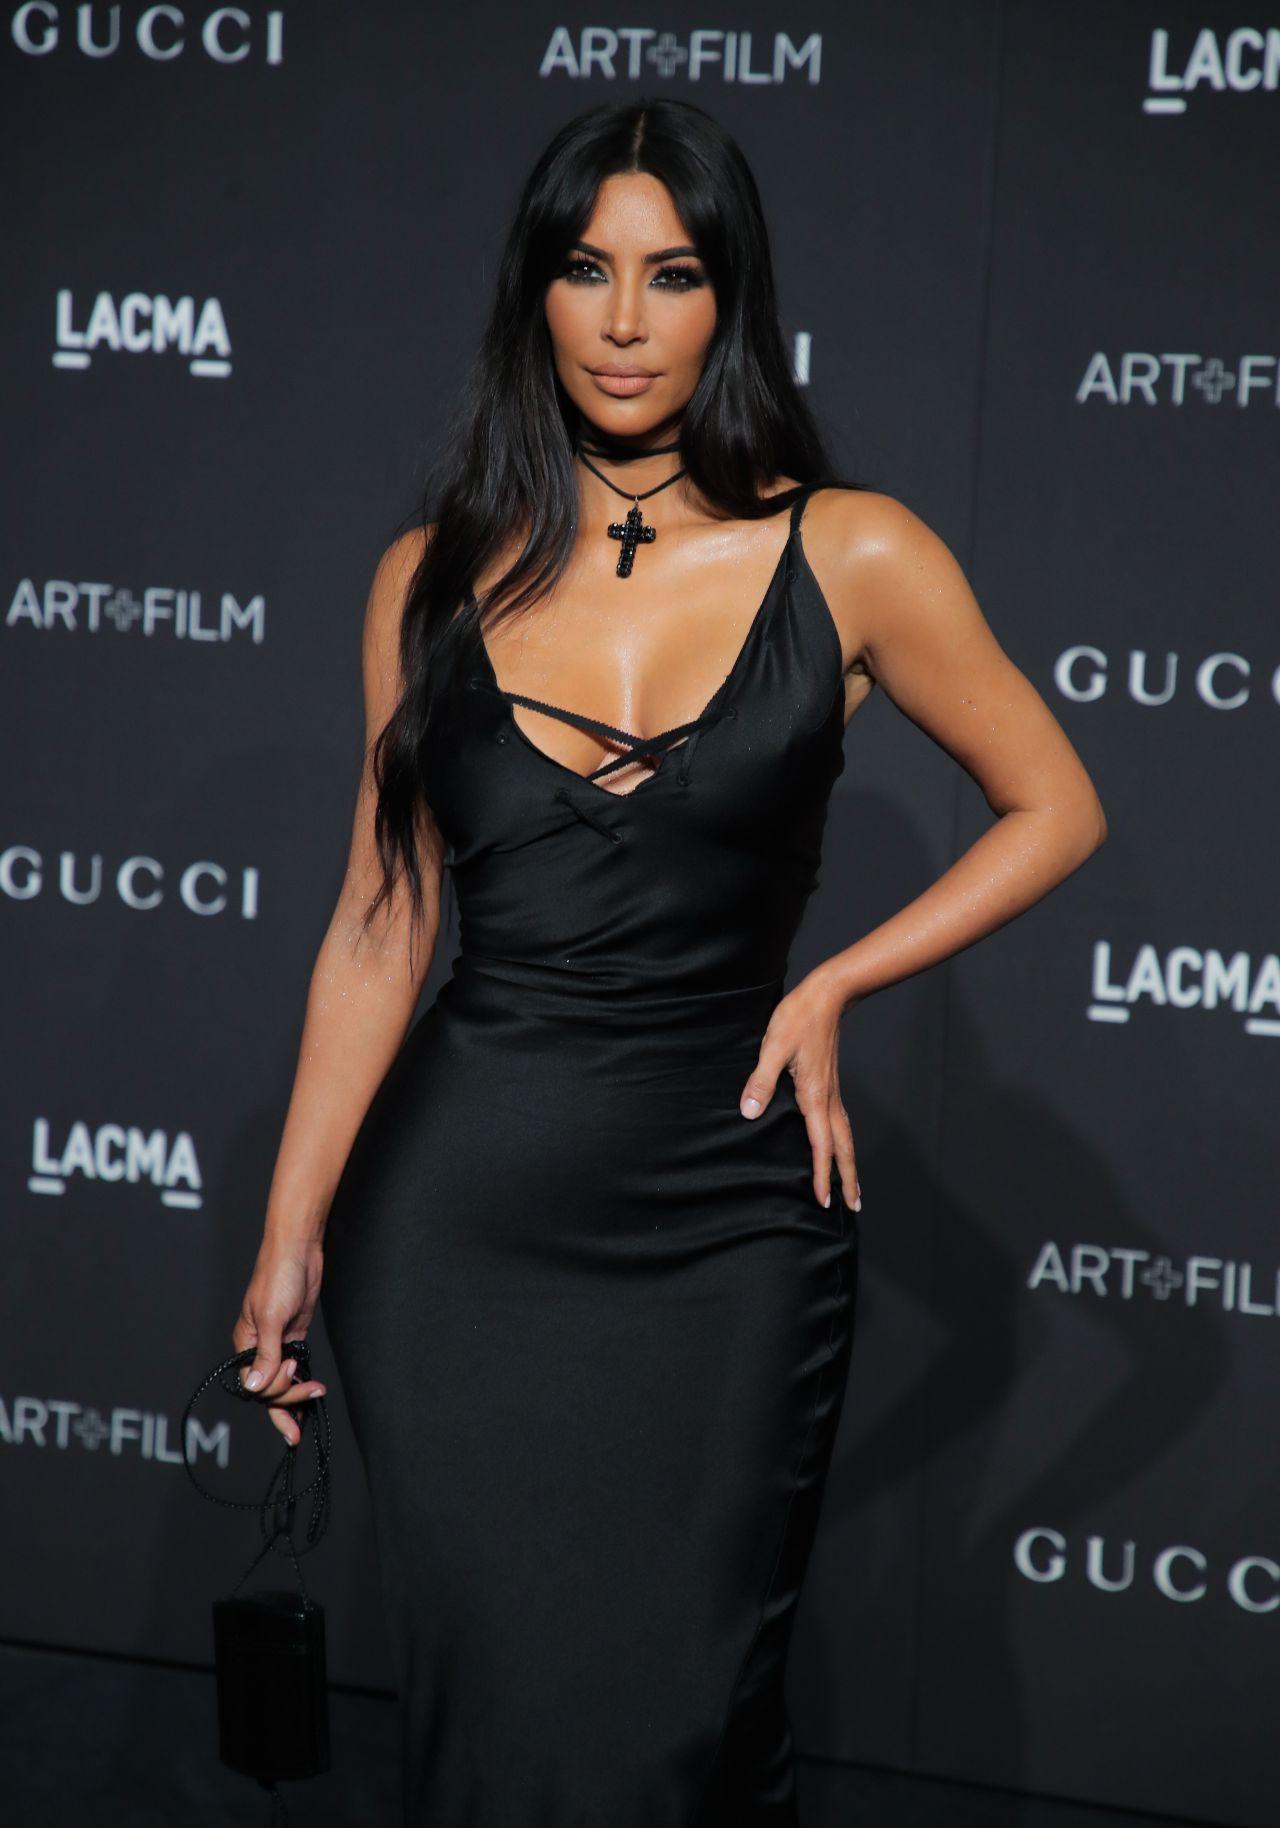 Kim Kardashian - 2018 LACMA: Art and Film Gala Kim Kardashian